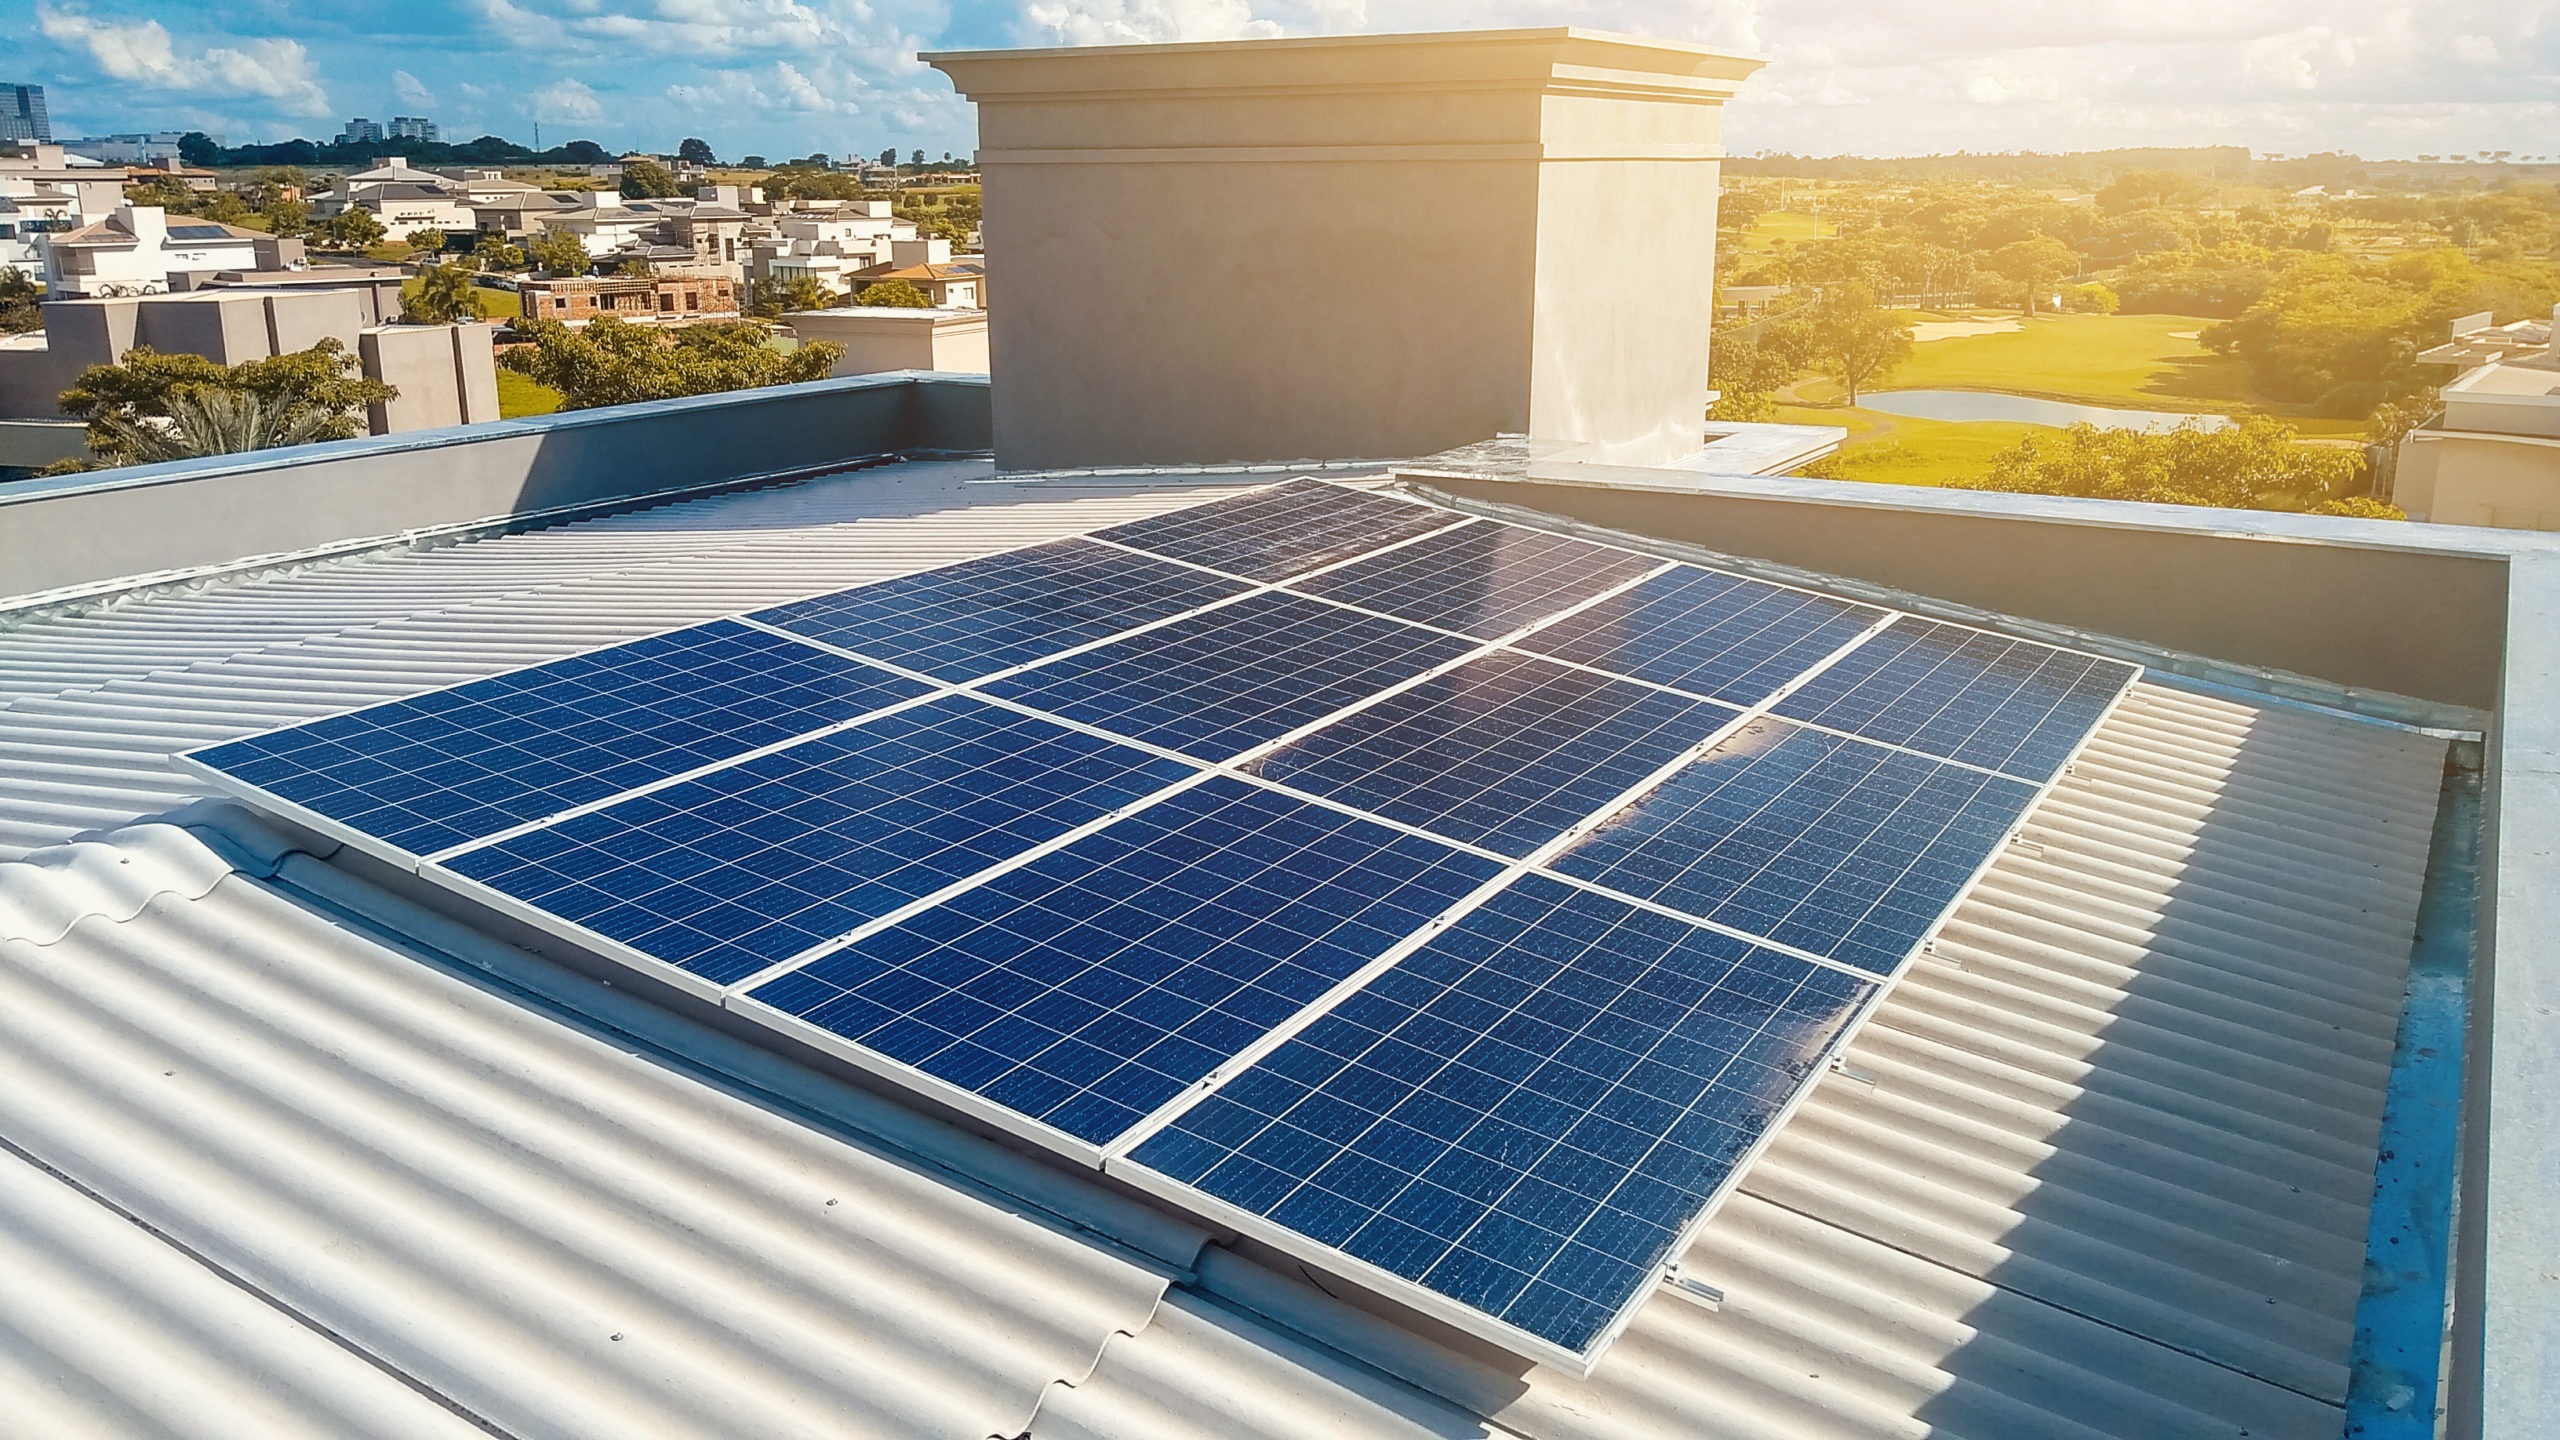 energia solar são josé sc _ painel solar residencial